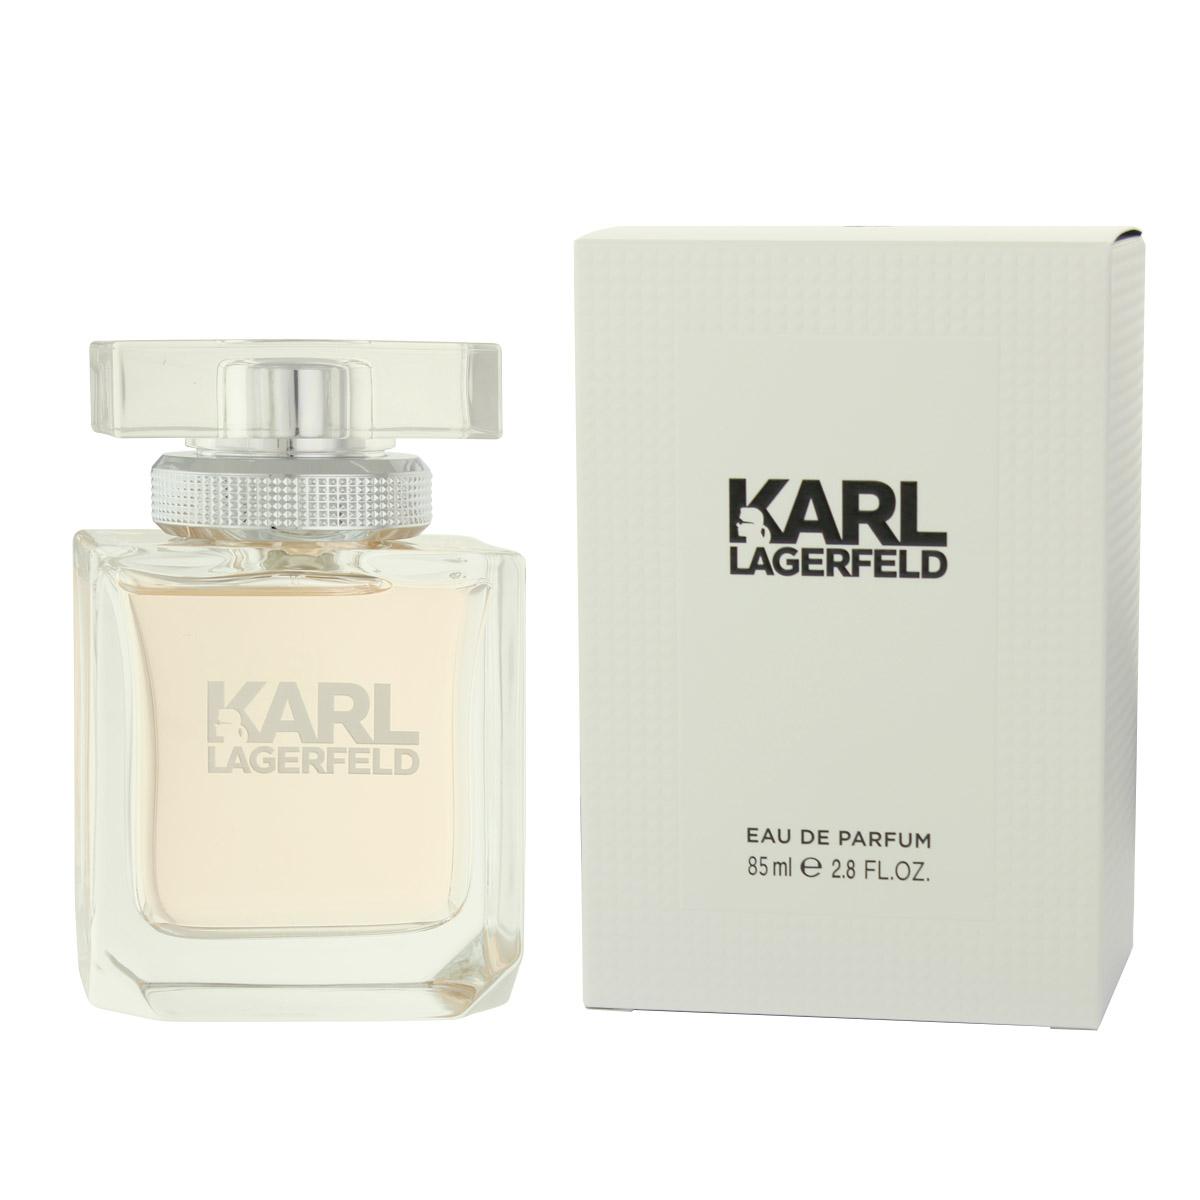 Karl Lagerfeld Karl Lagerfeld for Her Eau De Parfum 85 ml (woman) 76069